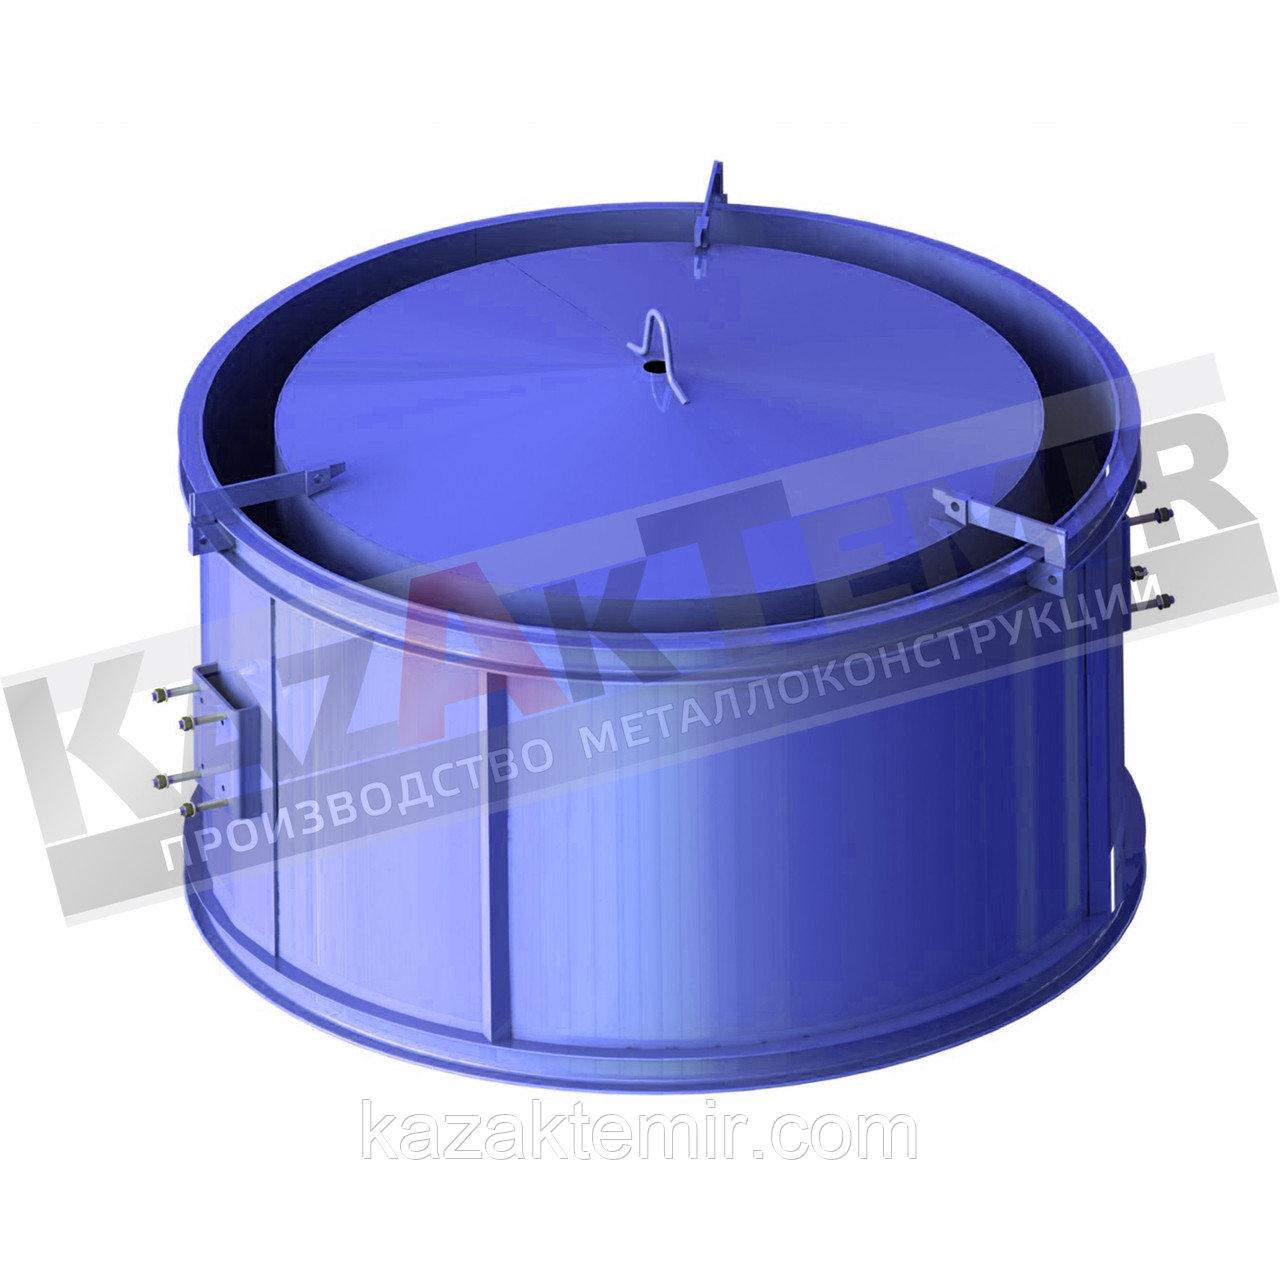 ЗК 9.200 для производства водопропускных труб (металлоформа)